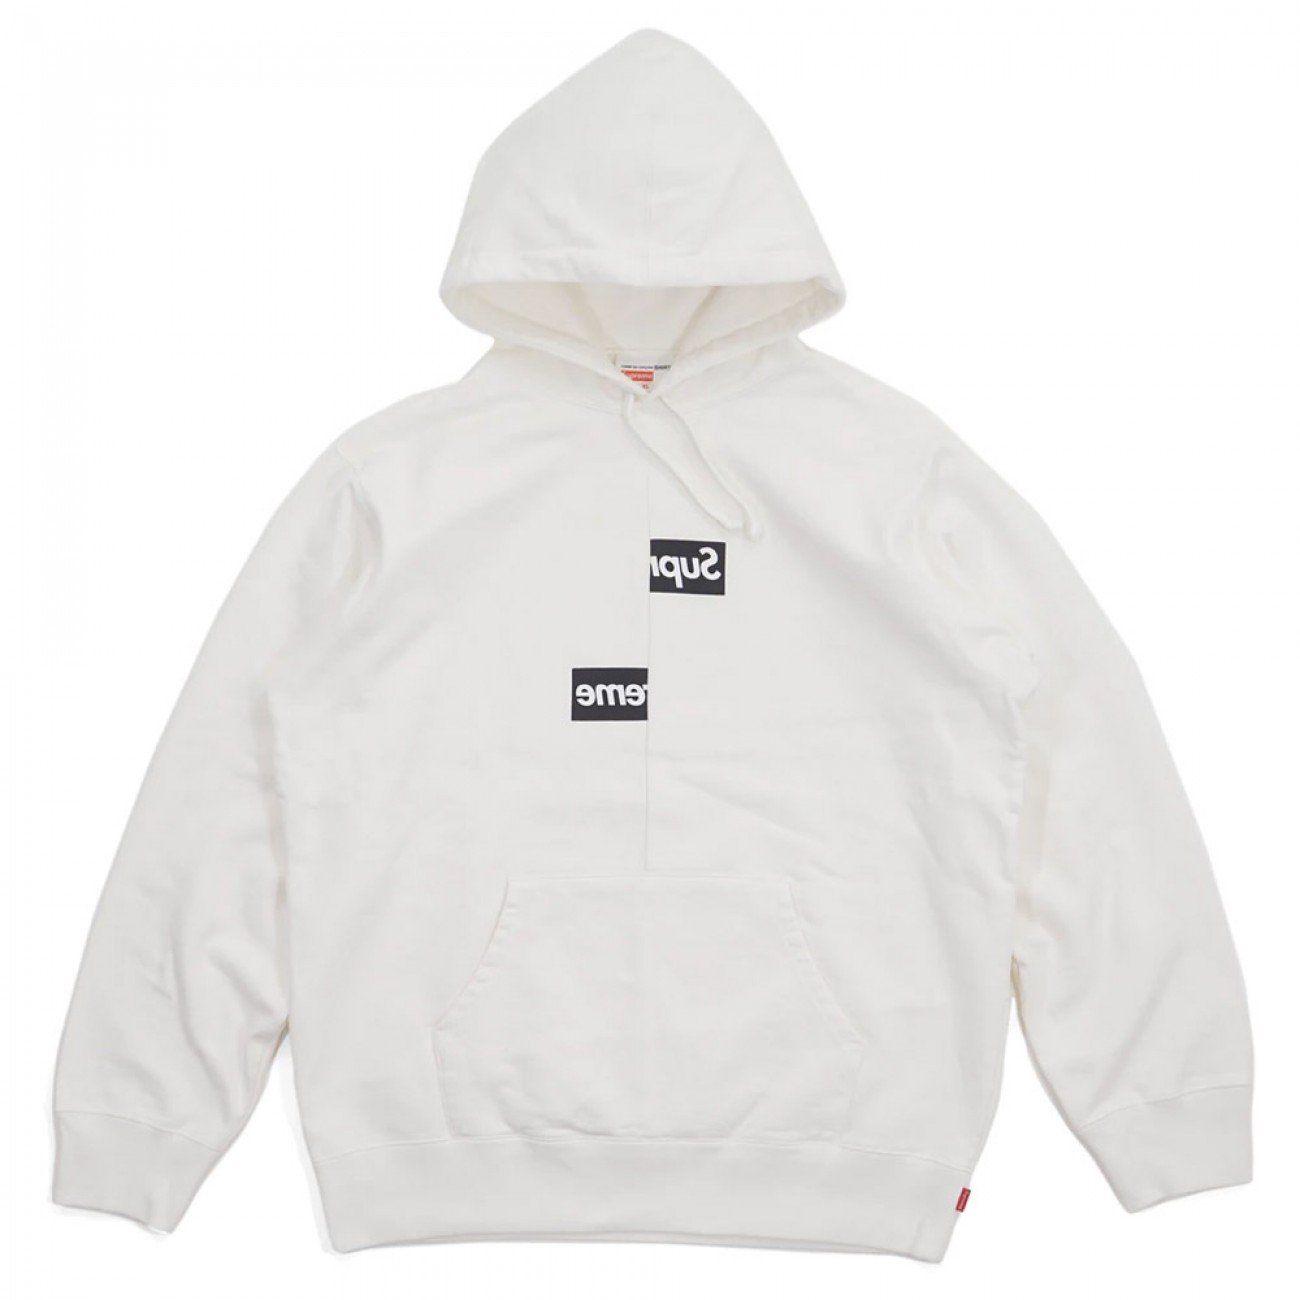 Supreme Comme Des Garcons Shirt Split Box Logo Hooded Sweatshirt White Crepsuk Hooded Sweatshirts Sweatshirts Hoodie White Sweatshirt [ 1300 x 1300 Pixel ]